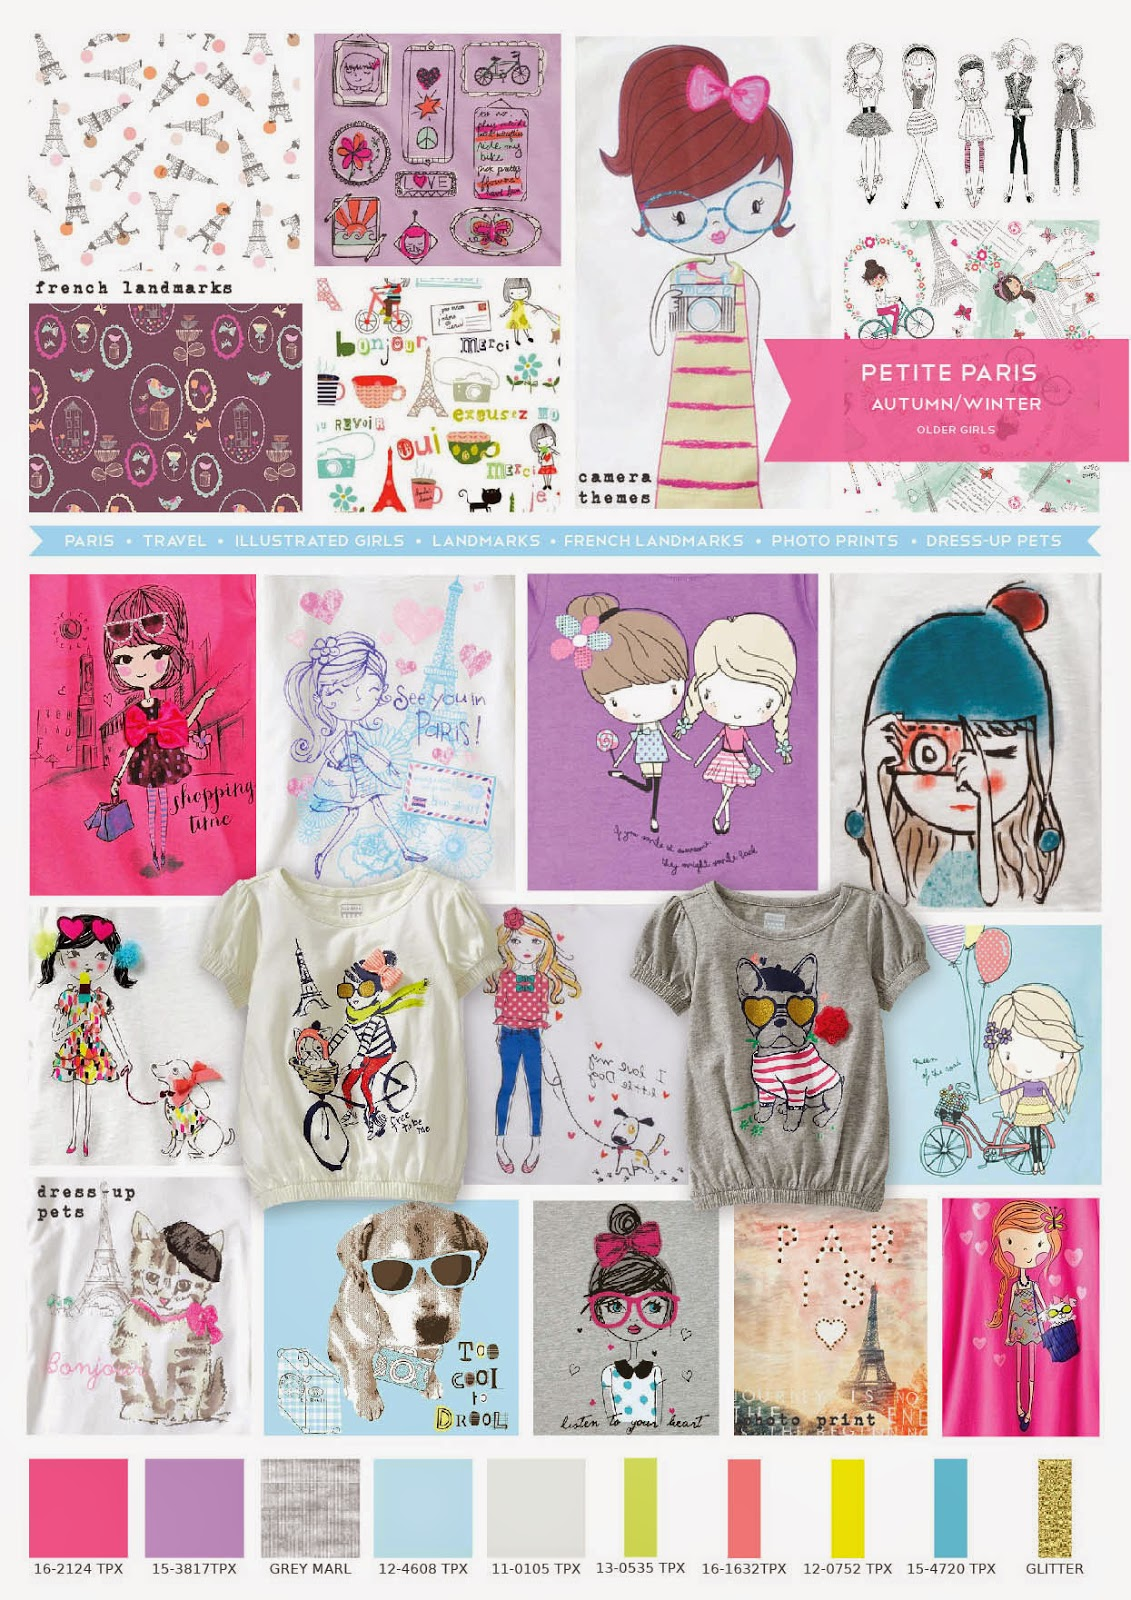 2018 s/s fashion trend 88